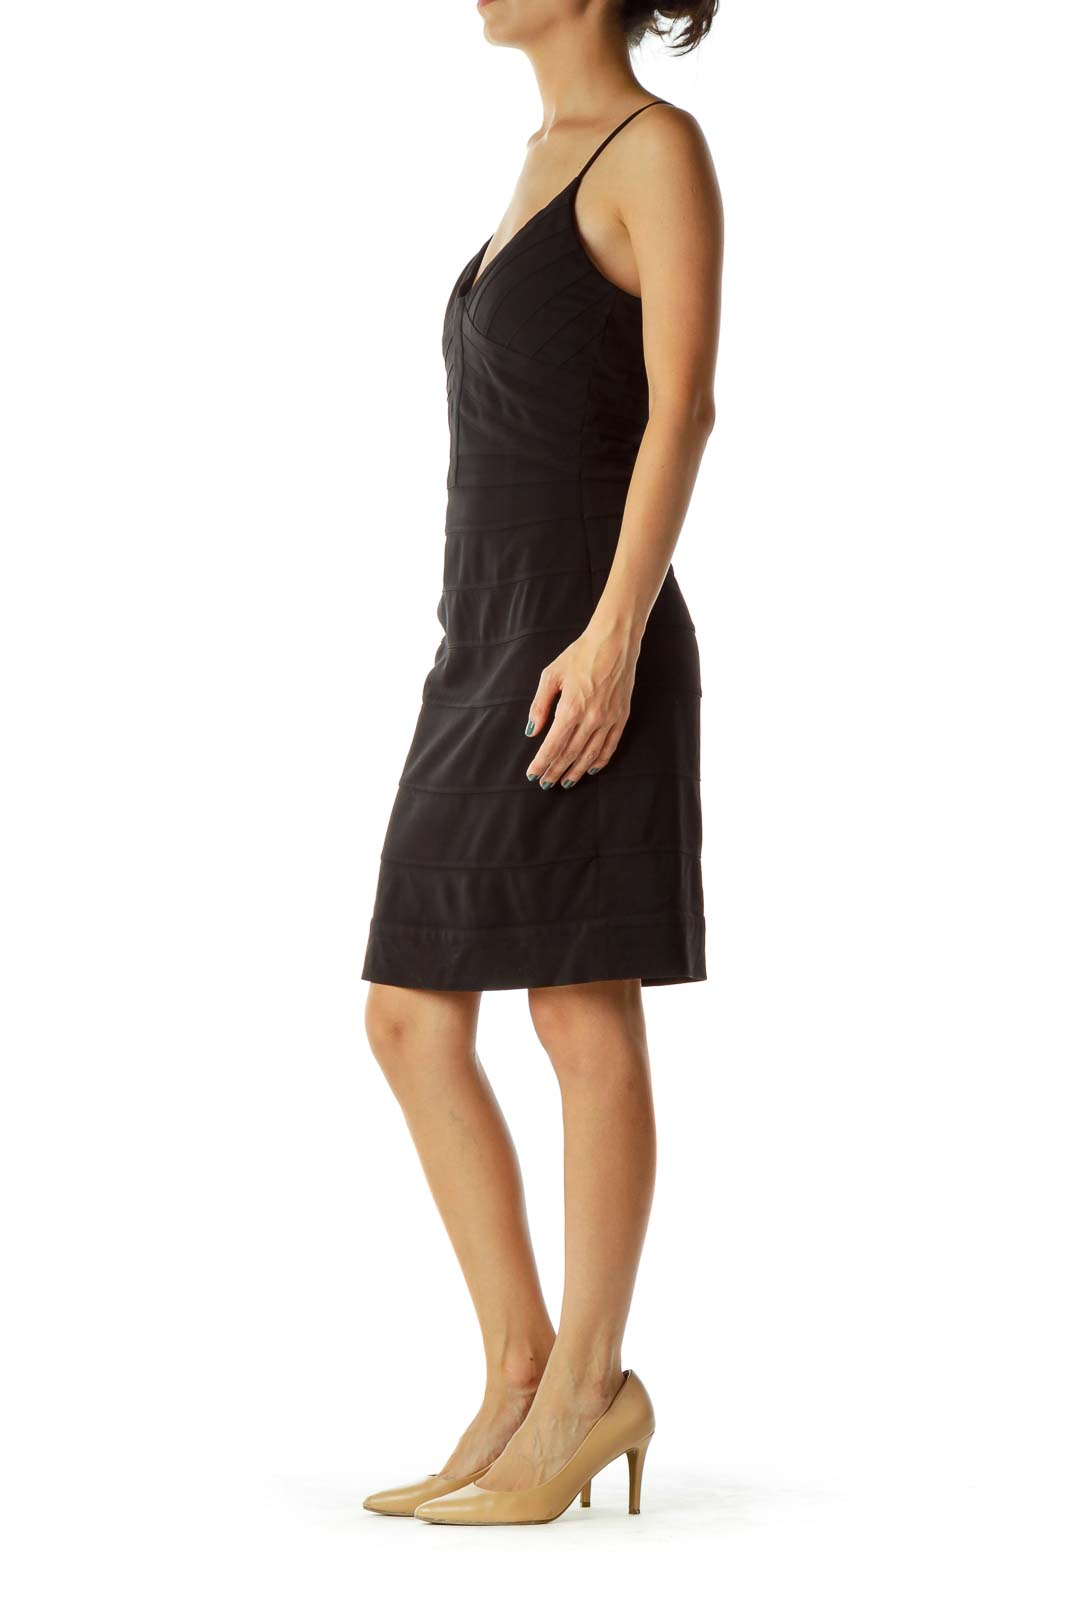 Black Stitched Bodycon Cocktail Dress